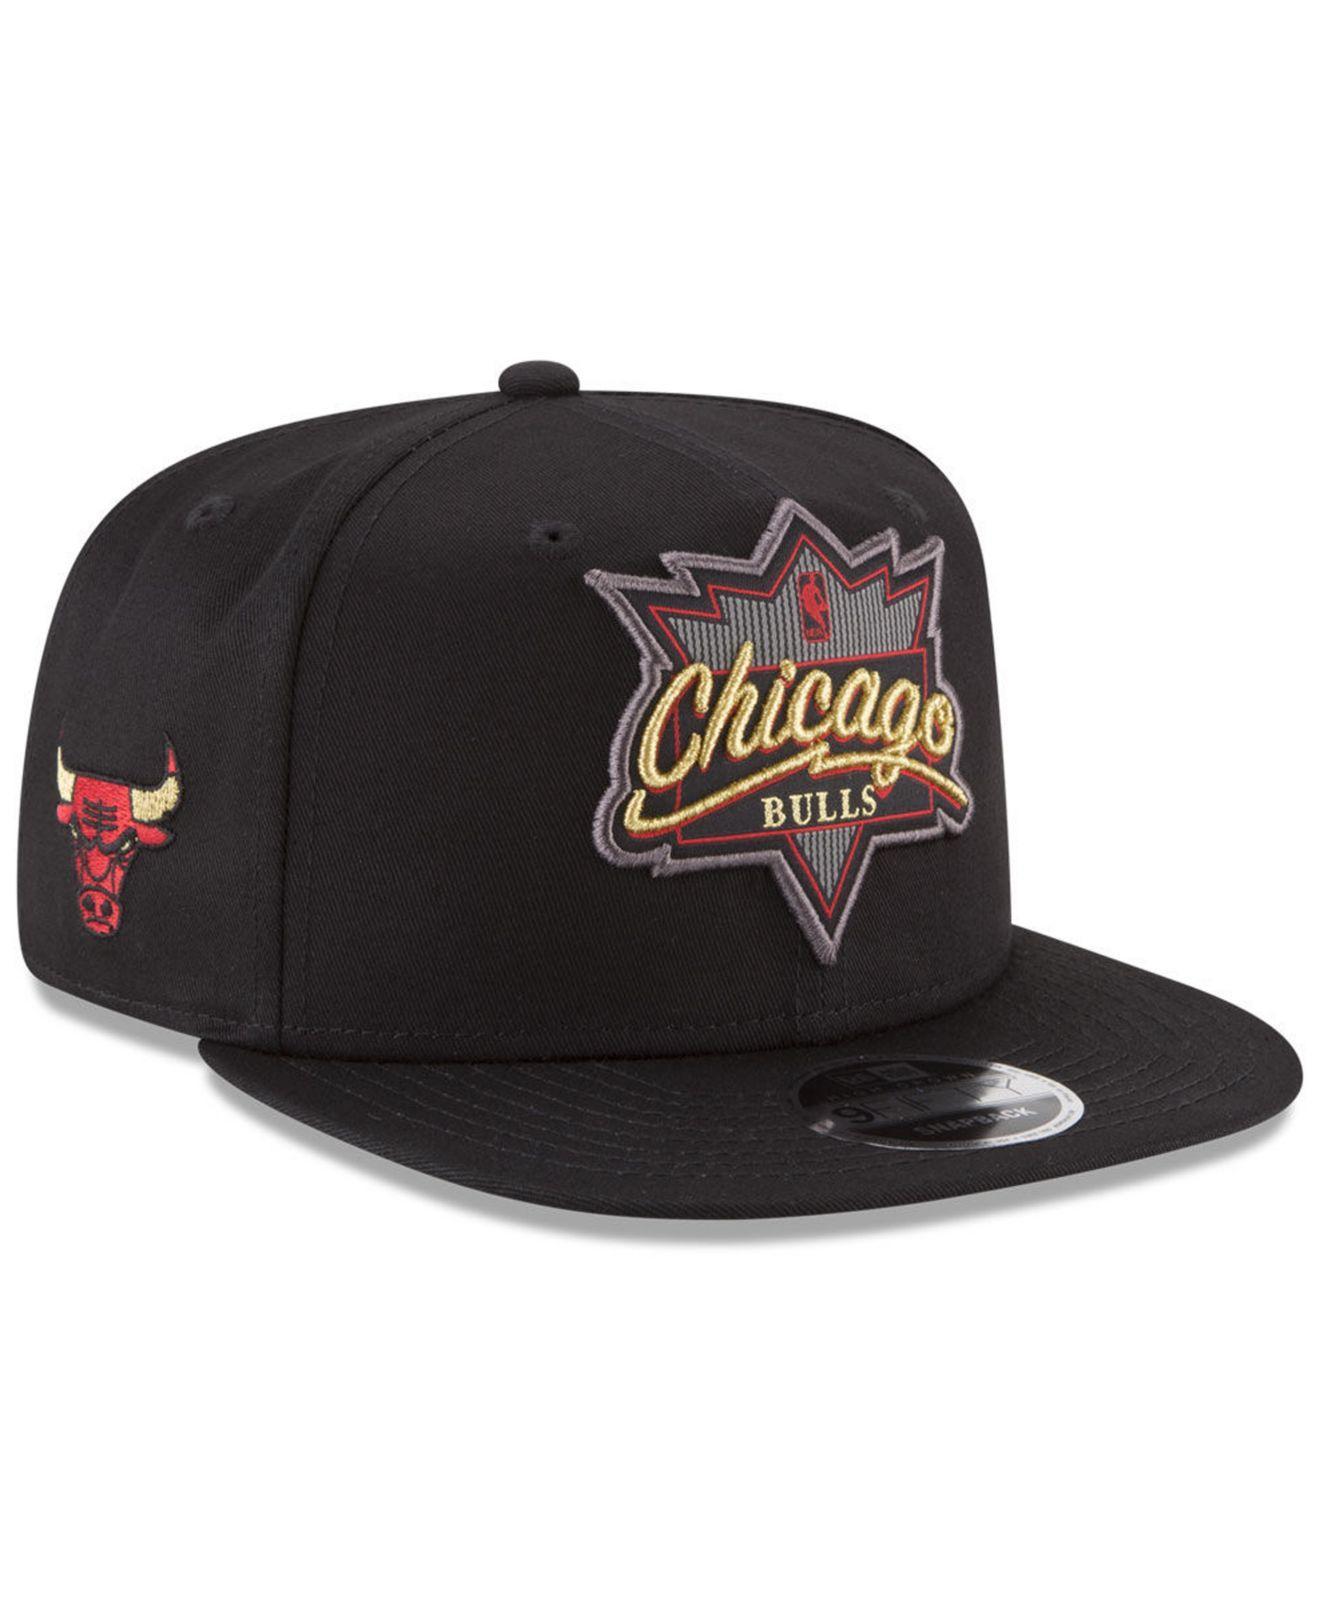 factory price b5091 46b11 ... coupon code ktz. mens black chicago bulls retro showtime 9fifty snapback  cap 05a2f b6f50